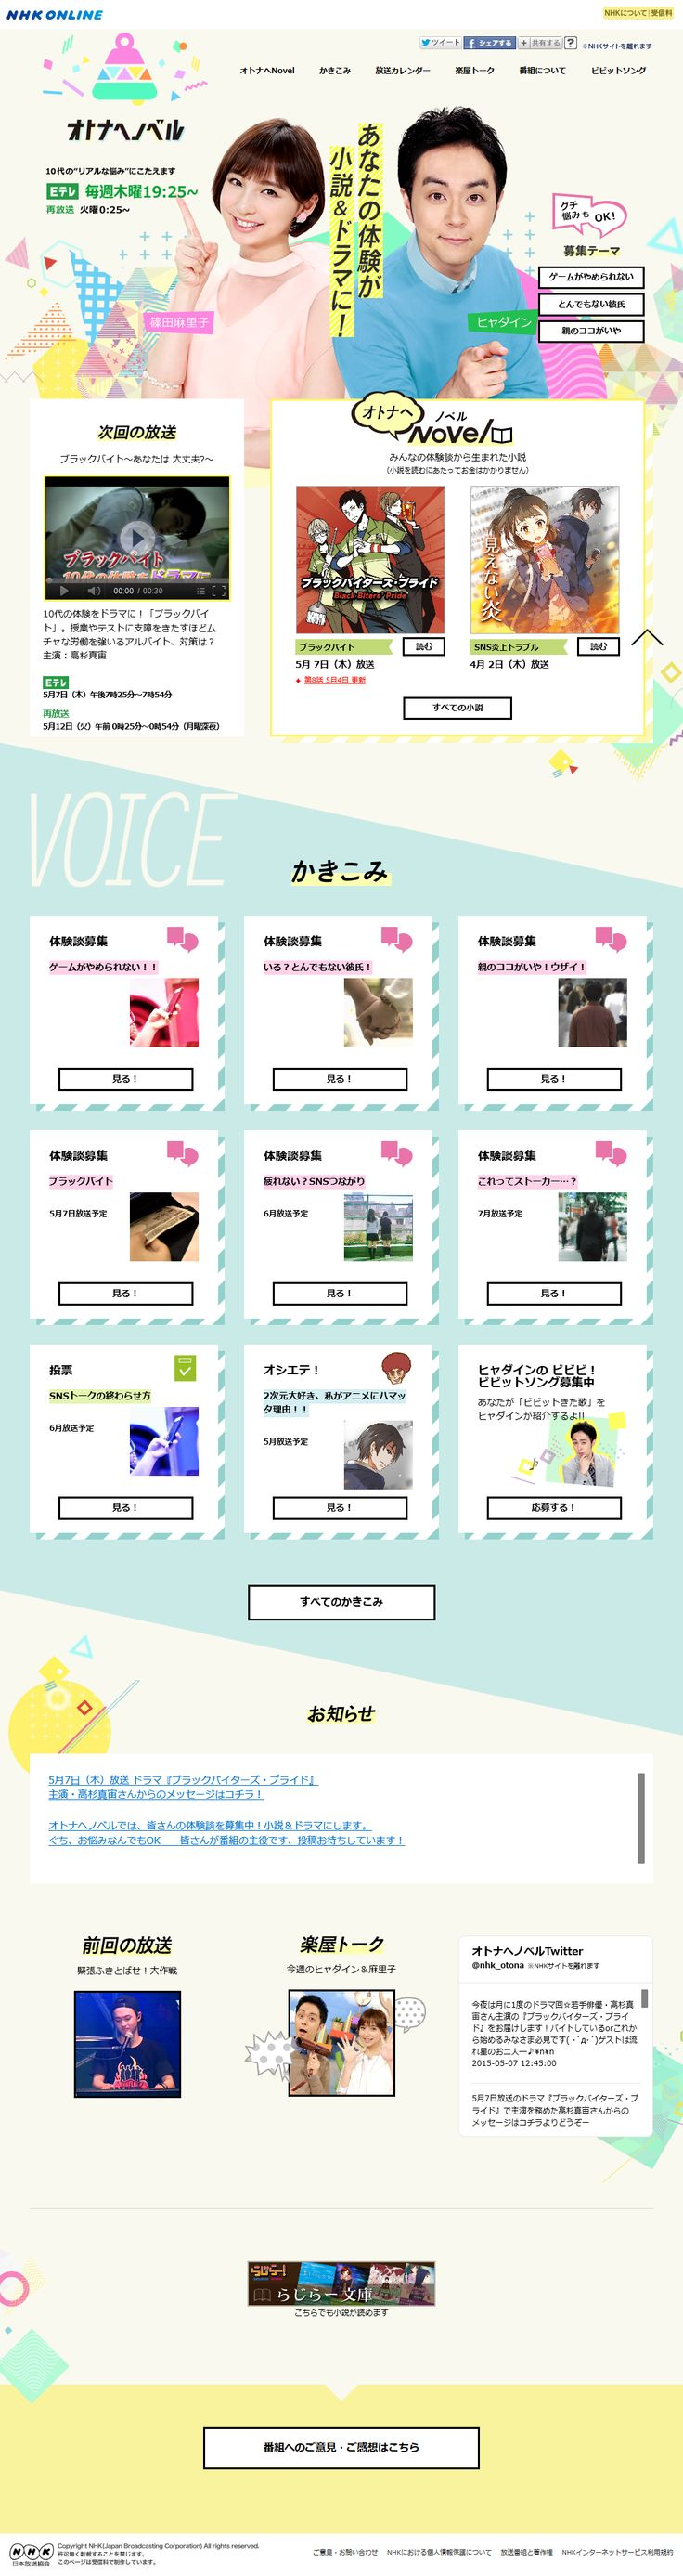 http://www6.nhk.or.jp/otona/index.html